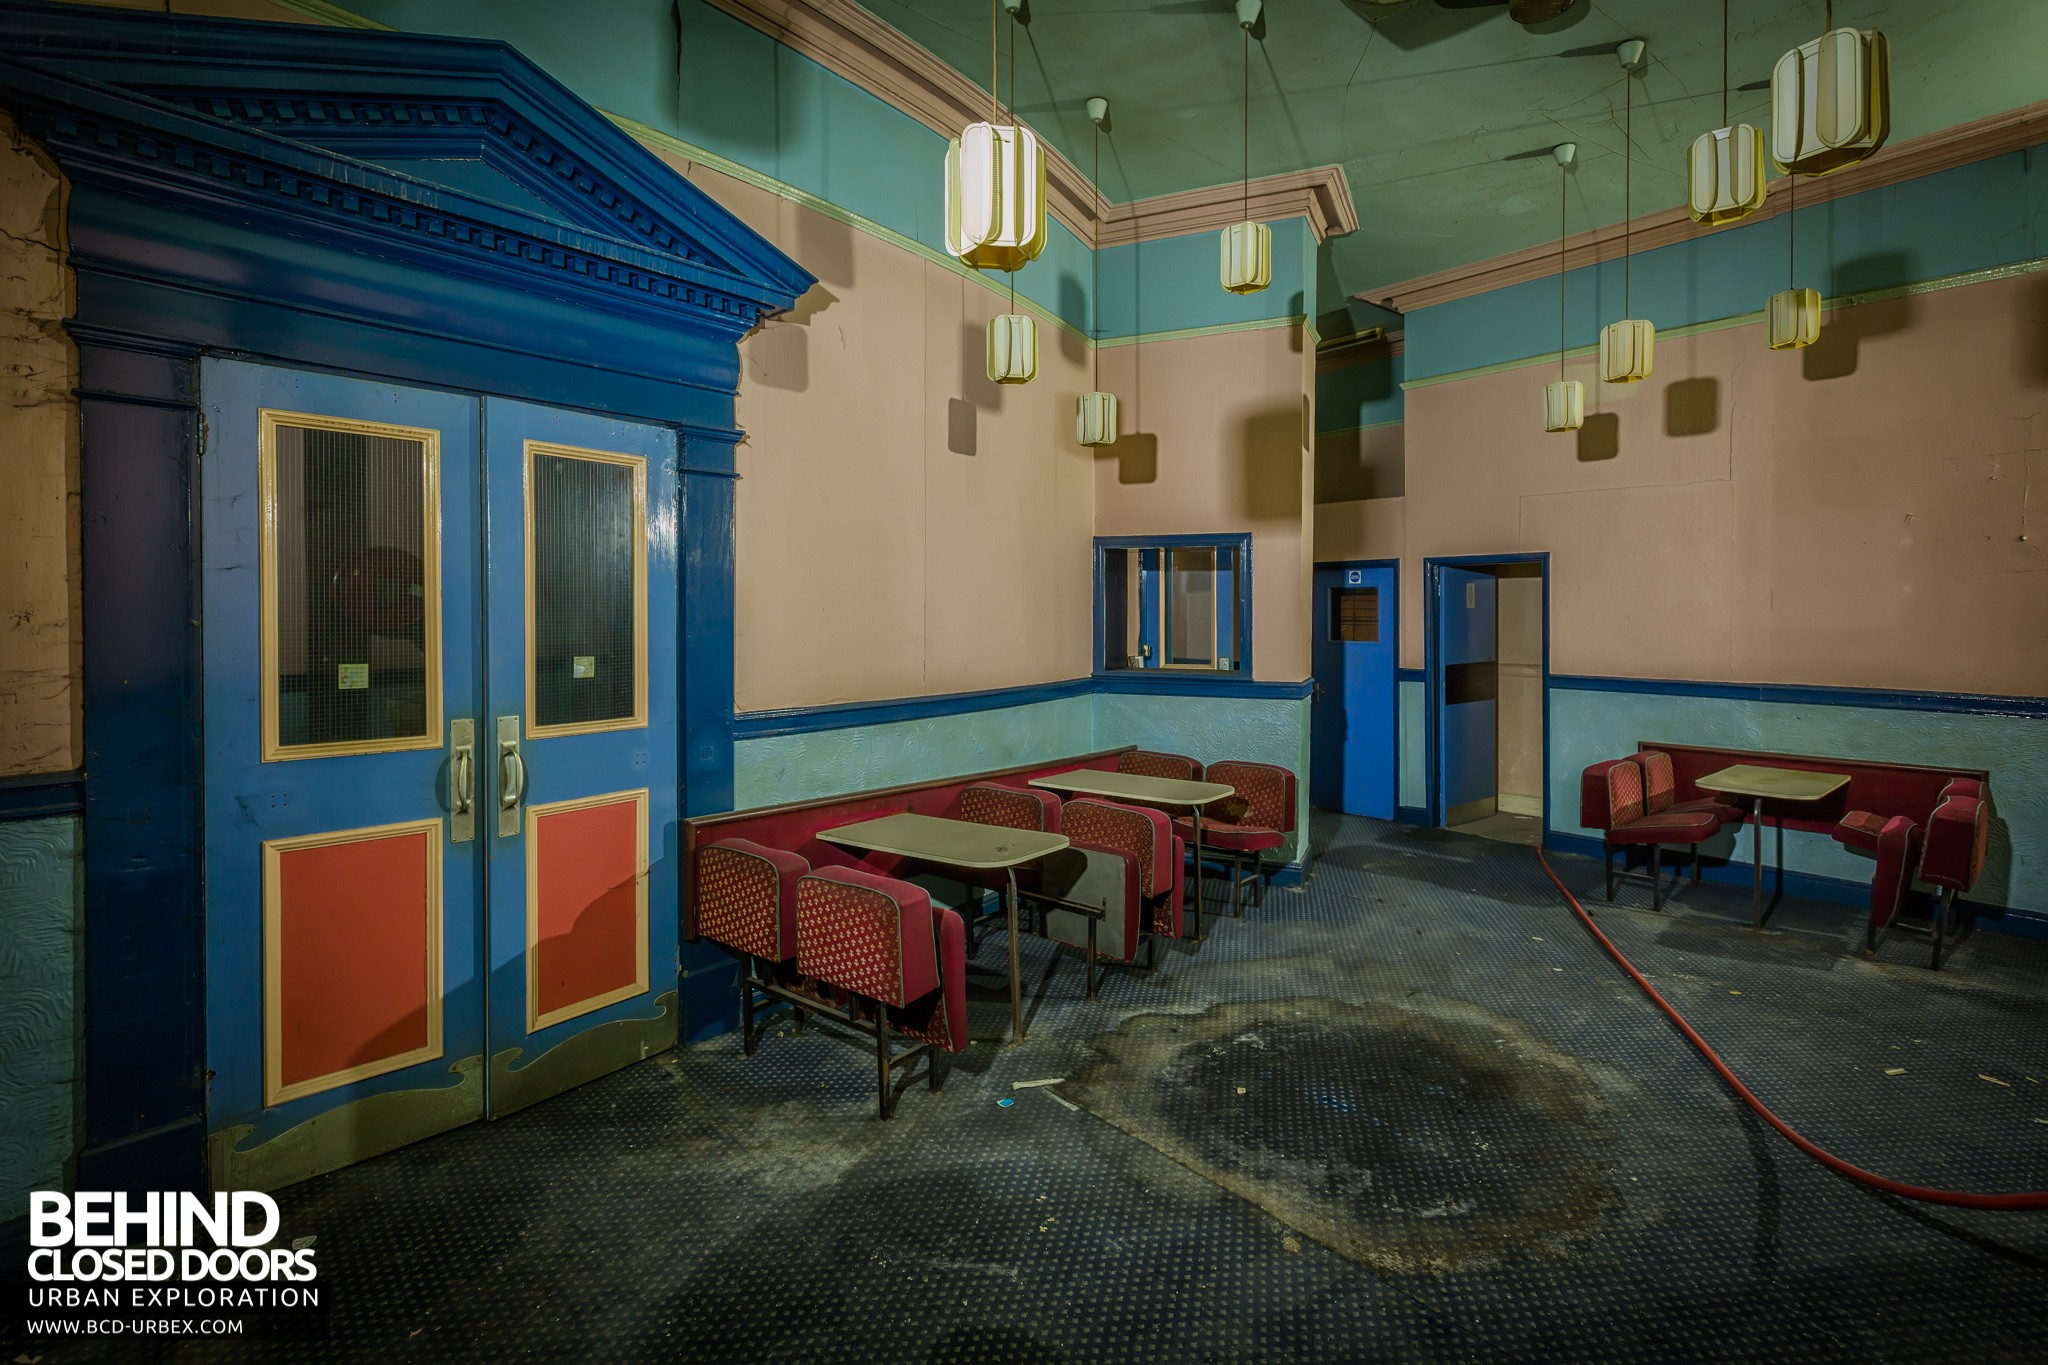 Grand Theatre Doncaster 187 Urbex Behind Closed Doors